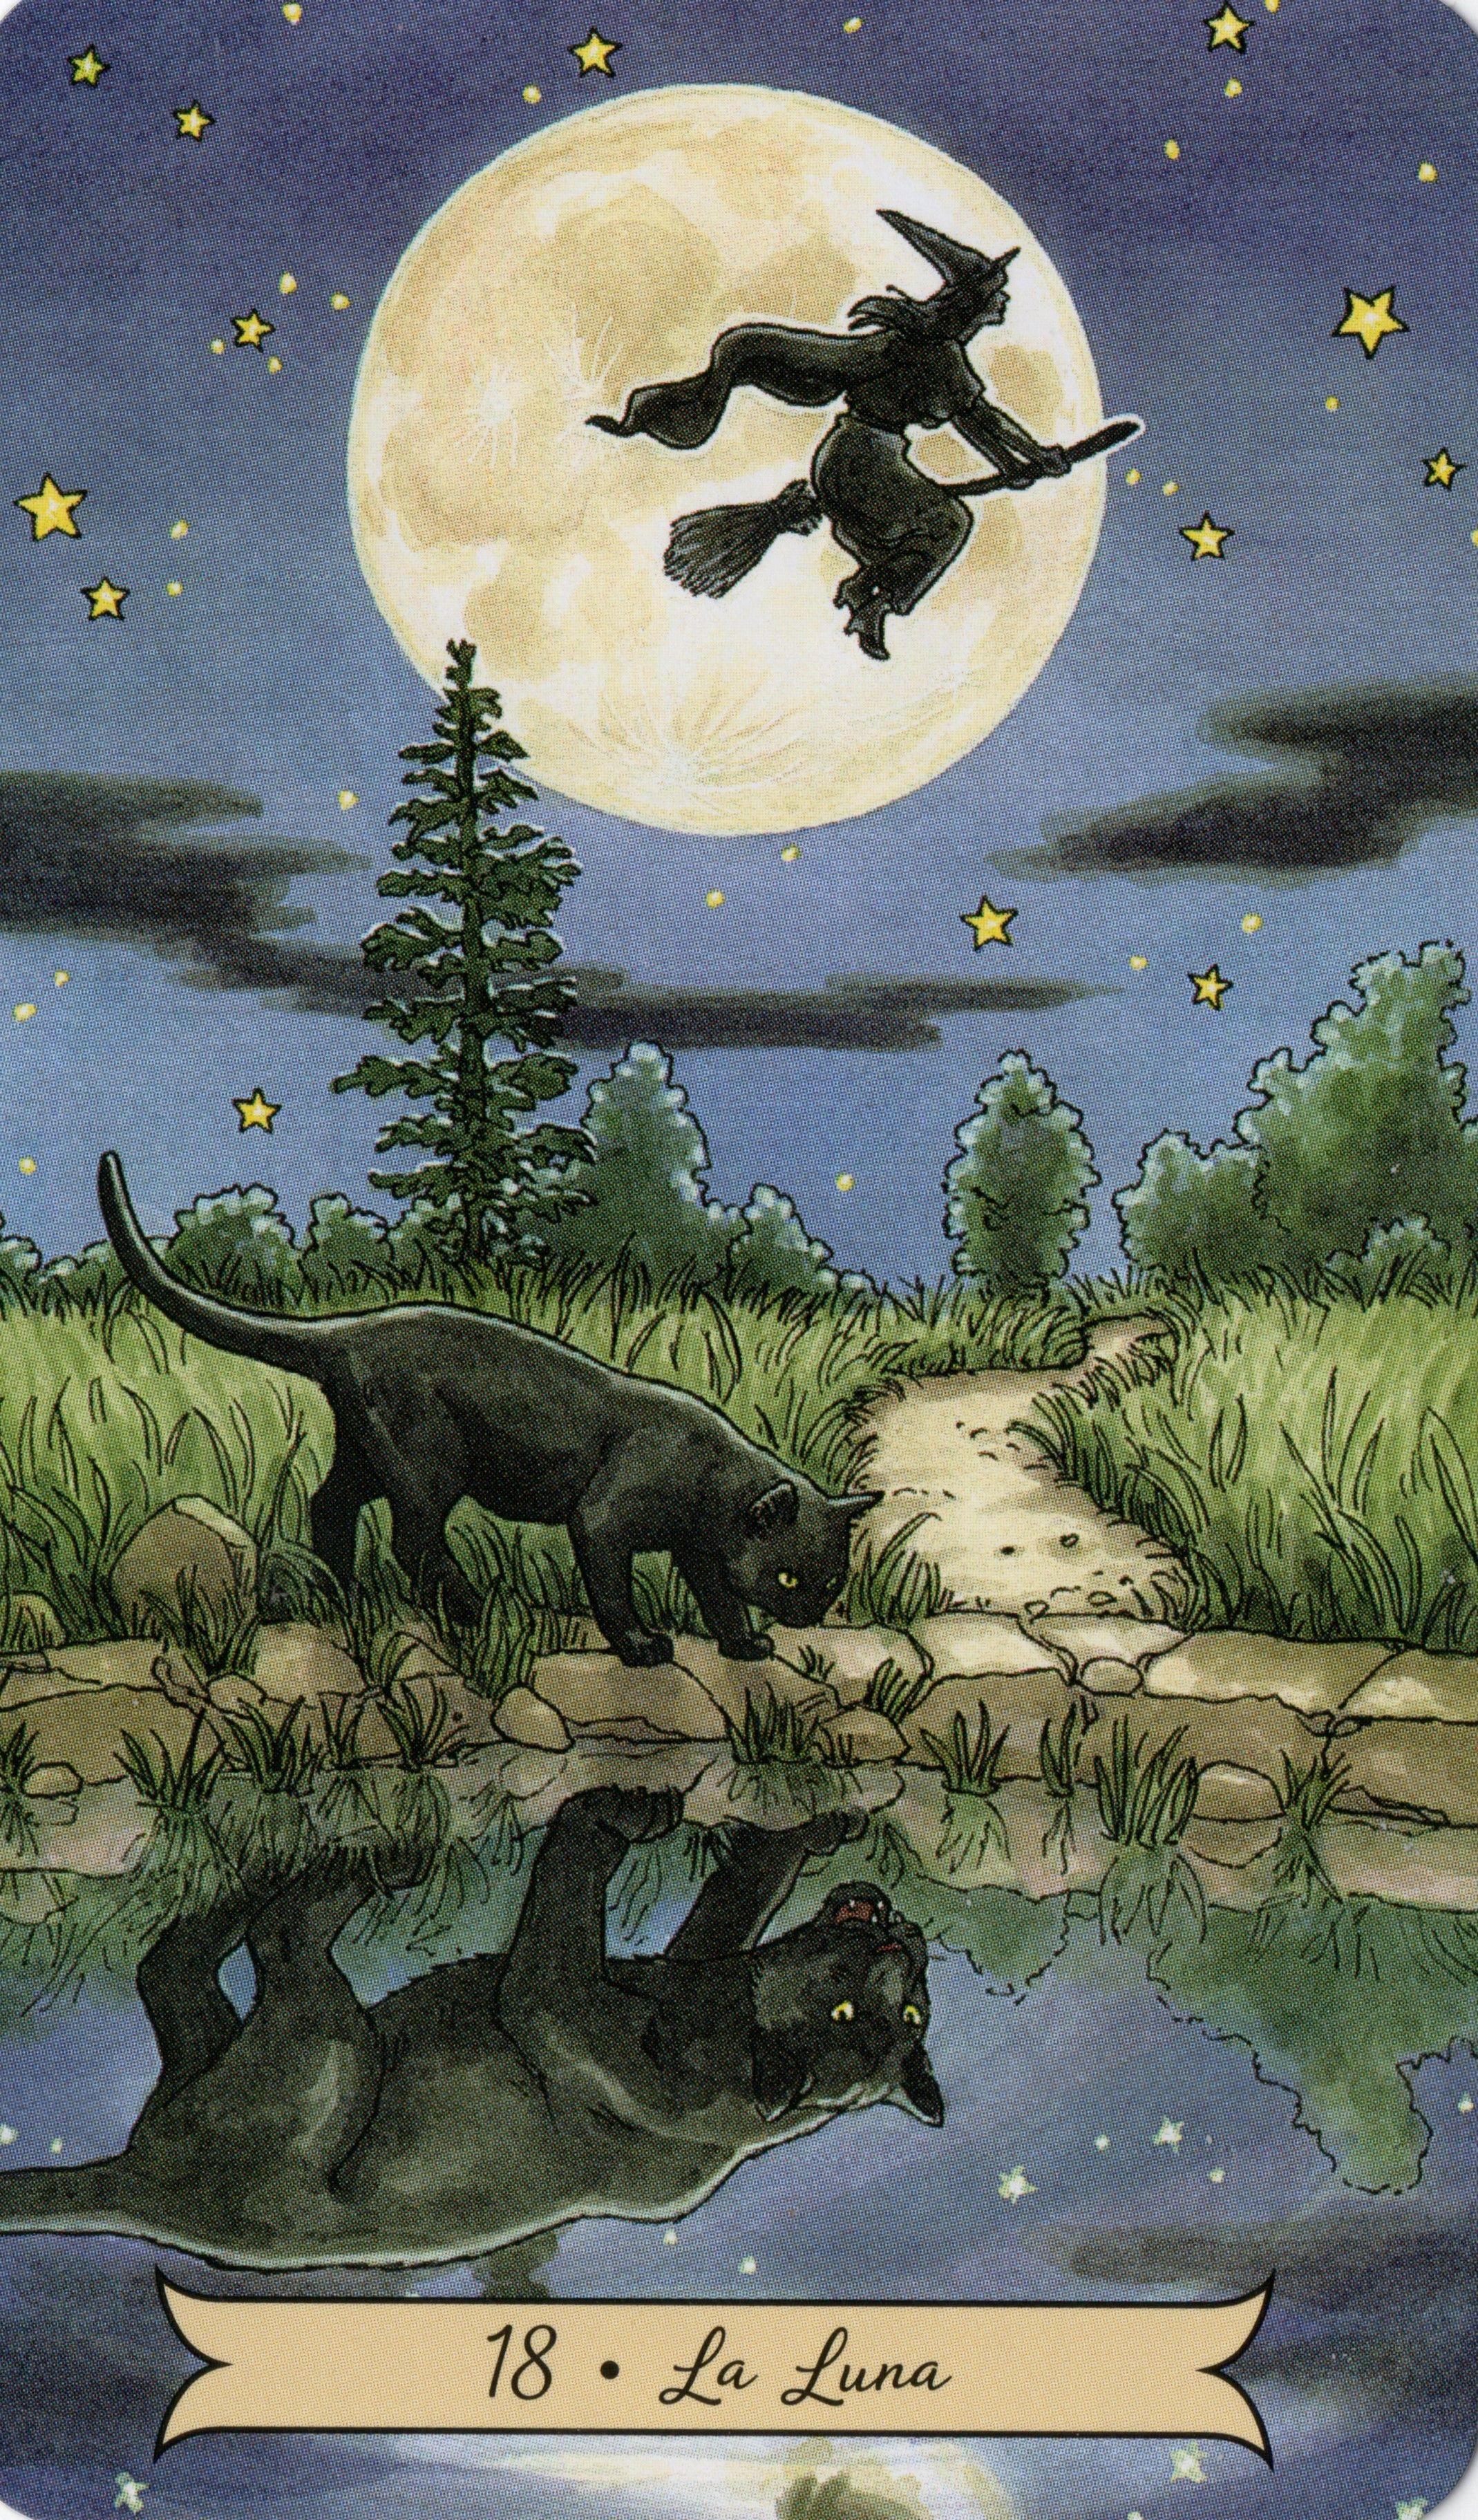 La Luna Bruja Dibujo Tarot Tarot Cartas